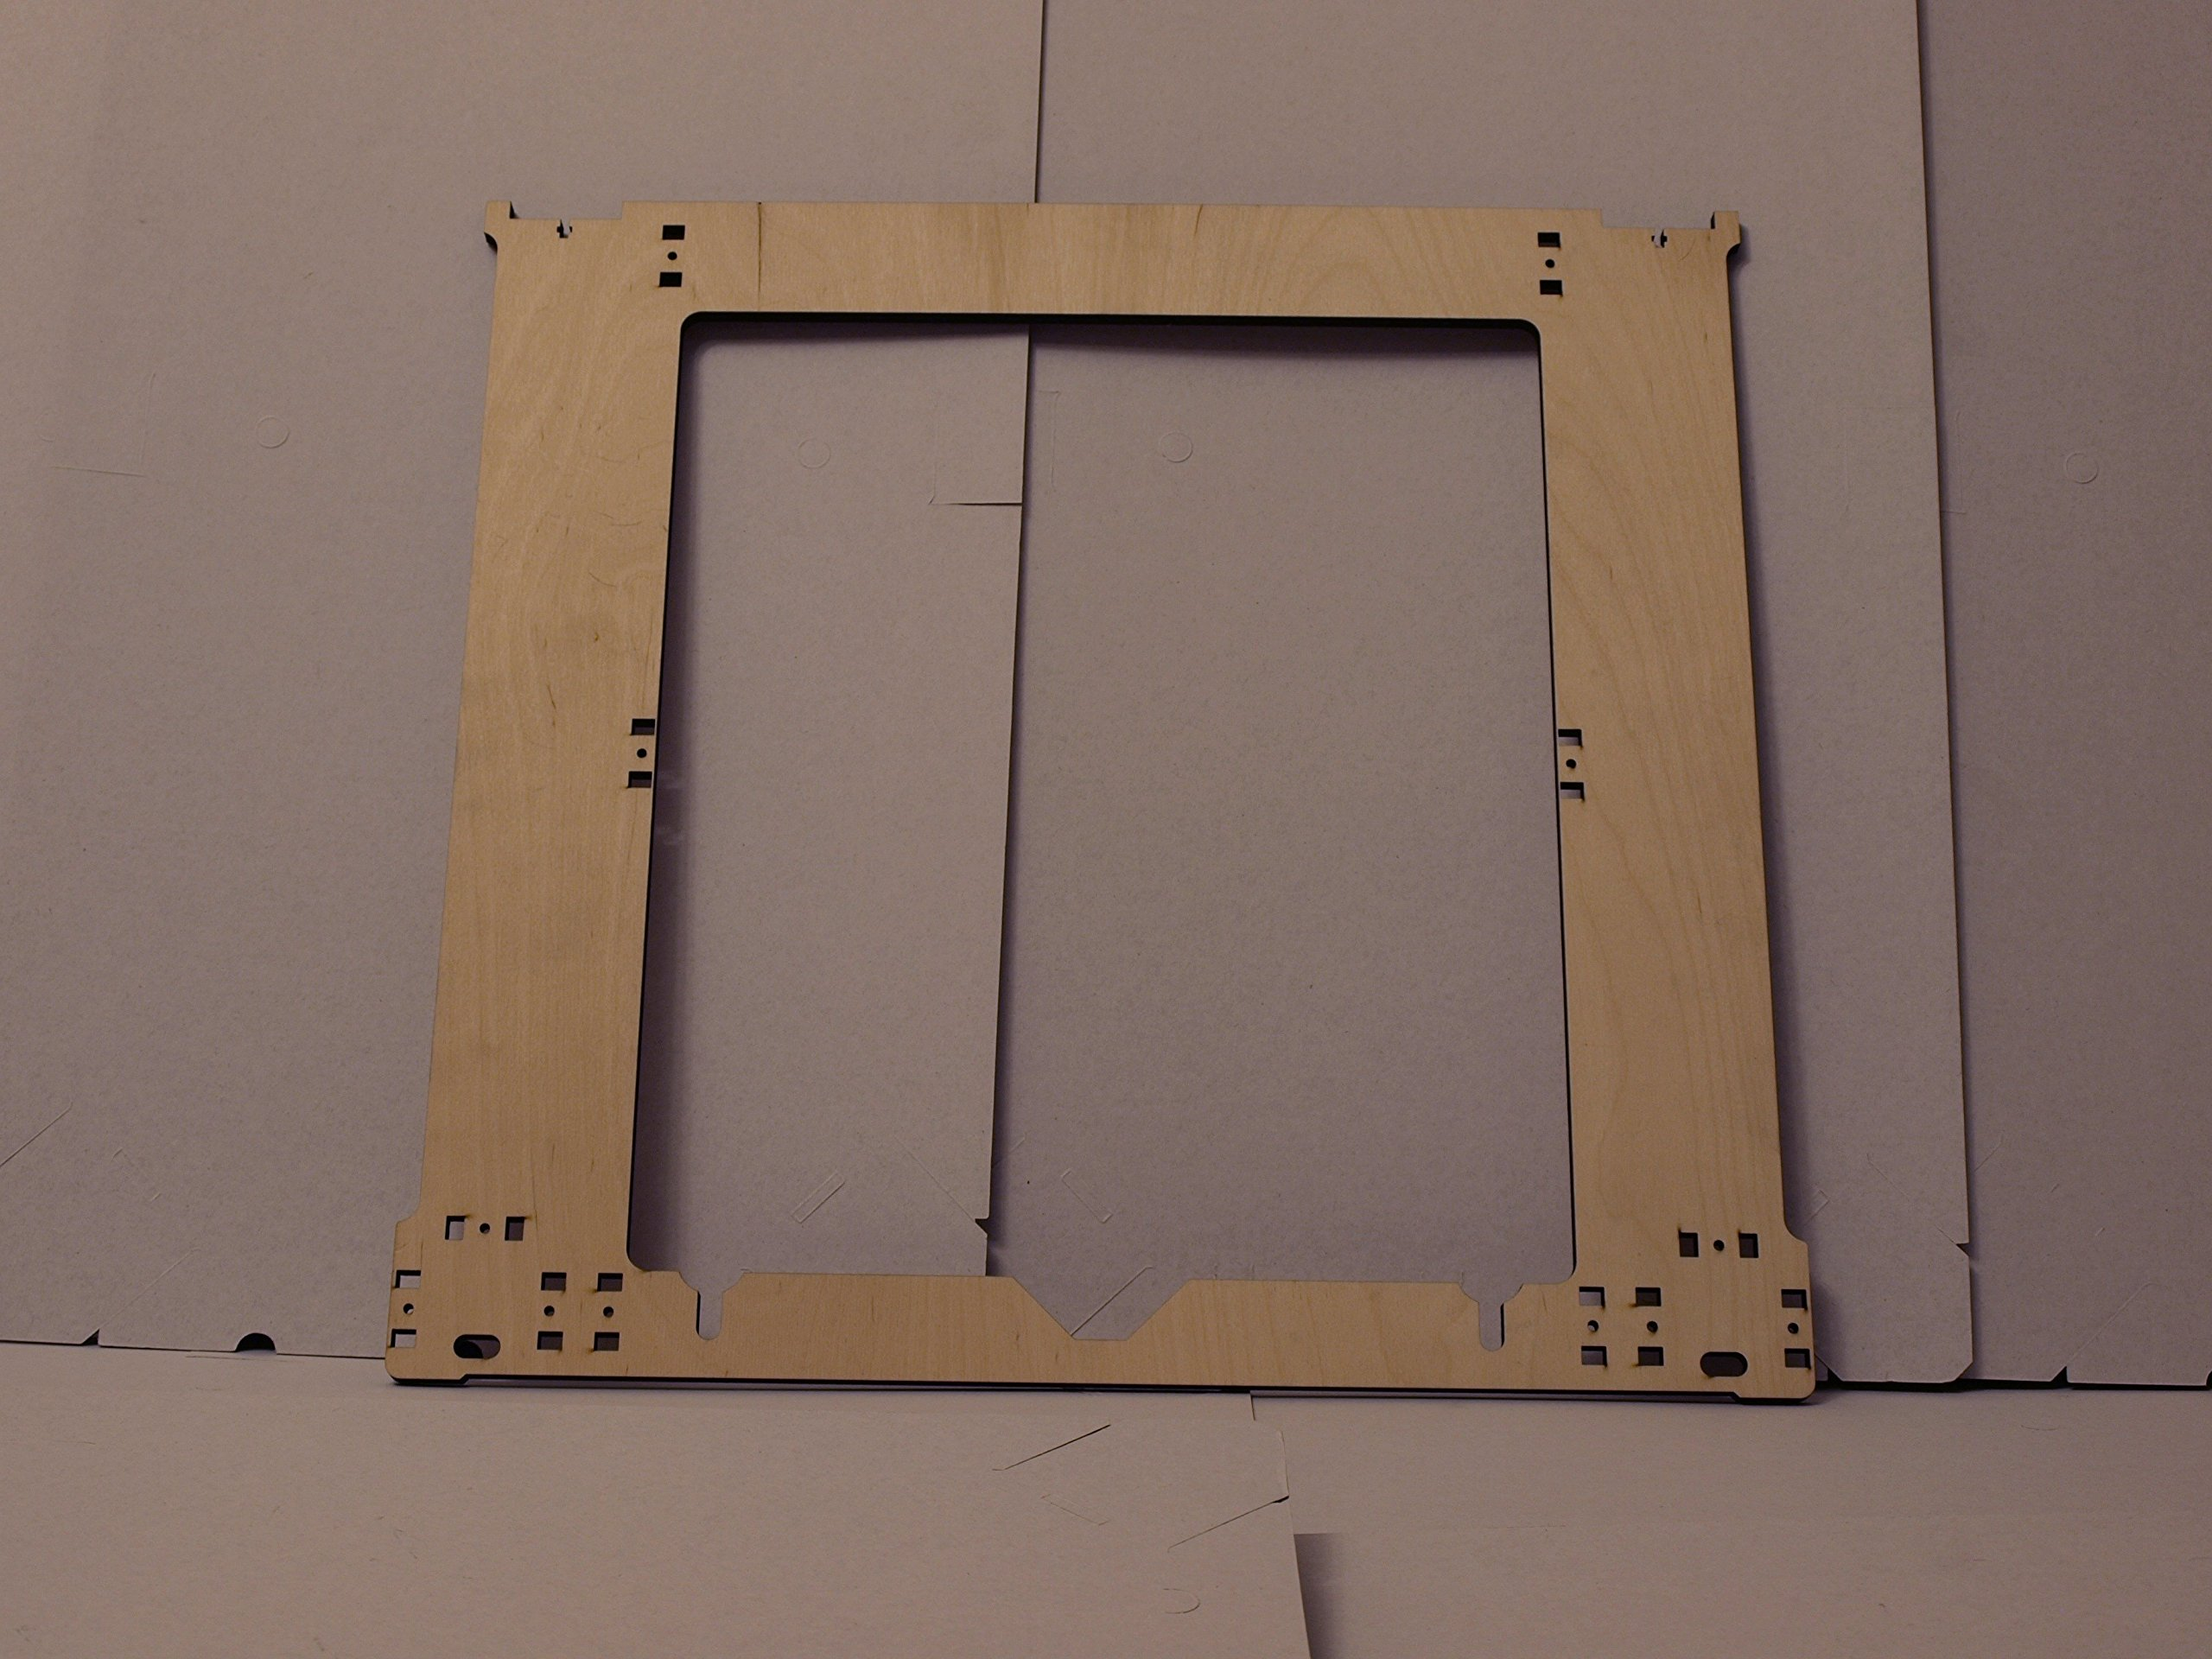 GO-3D PRINT 220mm x 220mm Polypropylene Glass Fiber Plate Bed w//Corners Cut for Wanhao i3 Anet A8 MP Maker Select 3D Printer